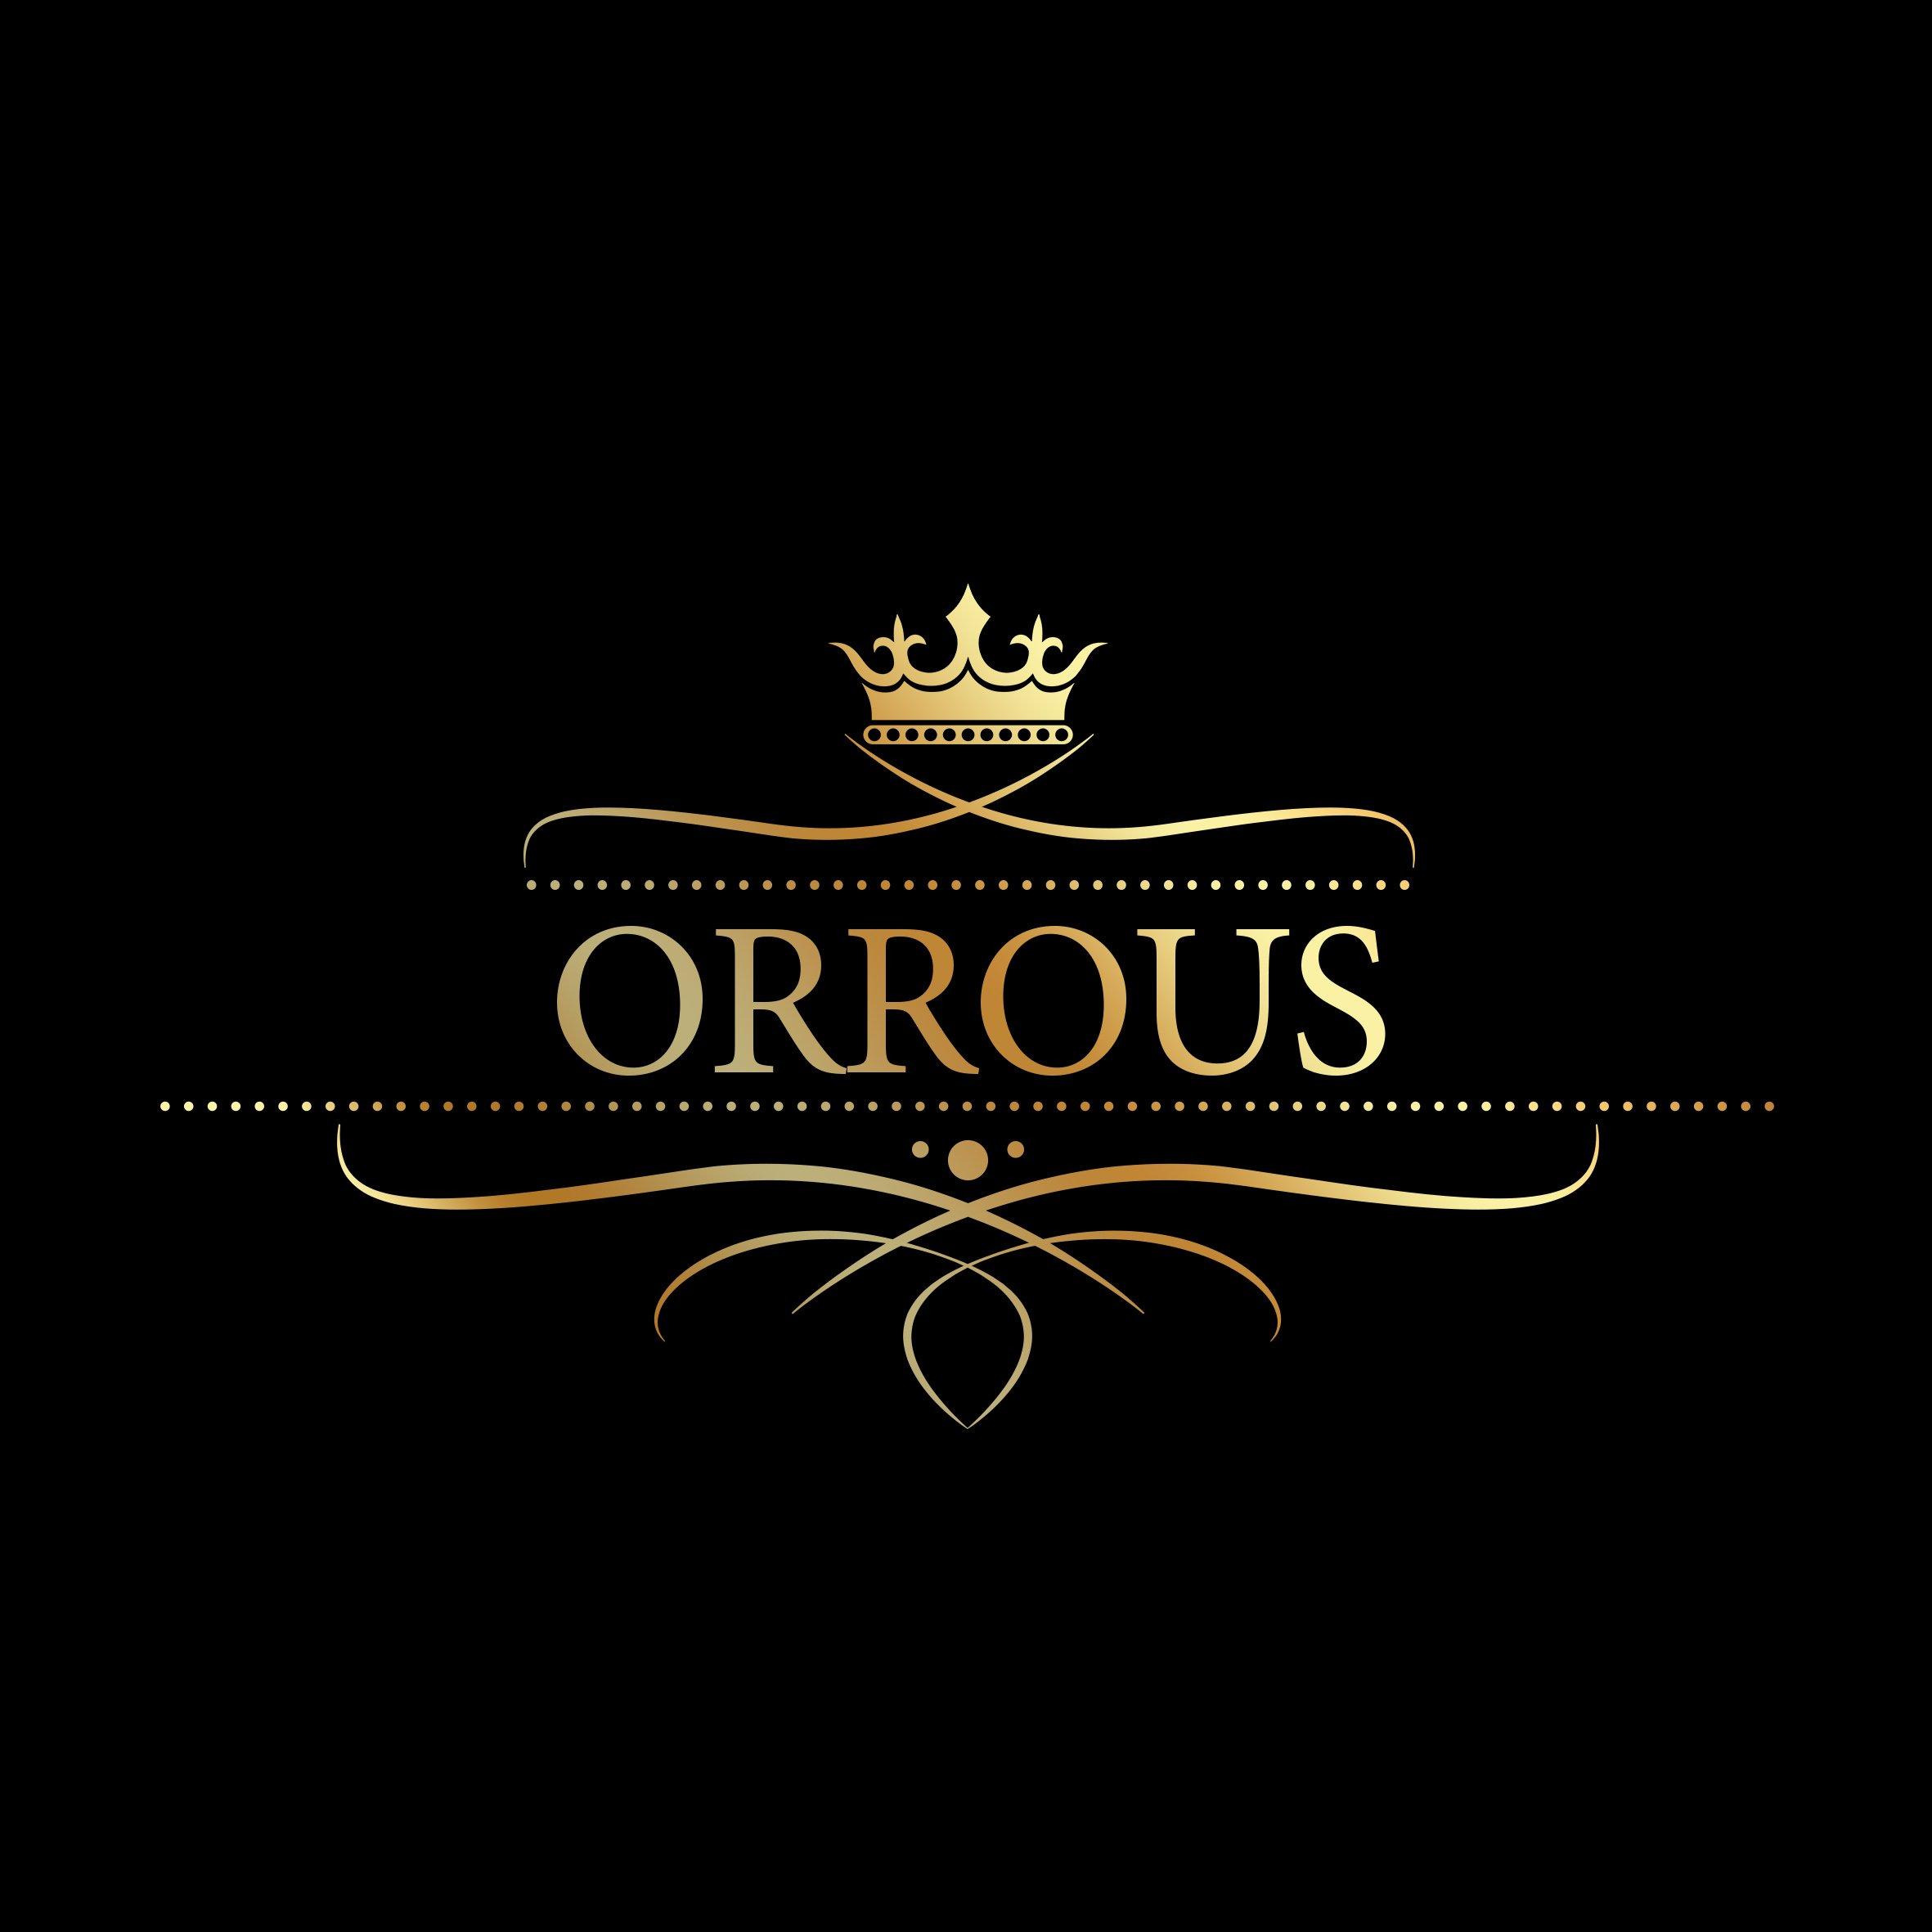 ORROUS & CO Women's 18k Cubic Zirconia Earrings - Beautiful White Gold Plated Studs - 1.90 Carats Round Cut Cubic Zirconia - Cushion Shaped Gemstone Halo - Beautiful & Elegant Gift Idea by ORROUS & CO (Image #8)